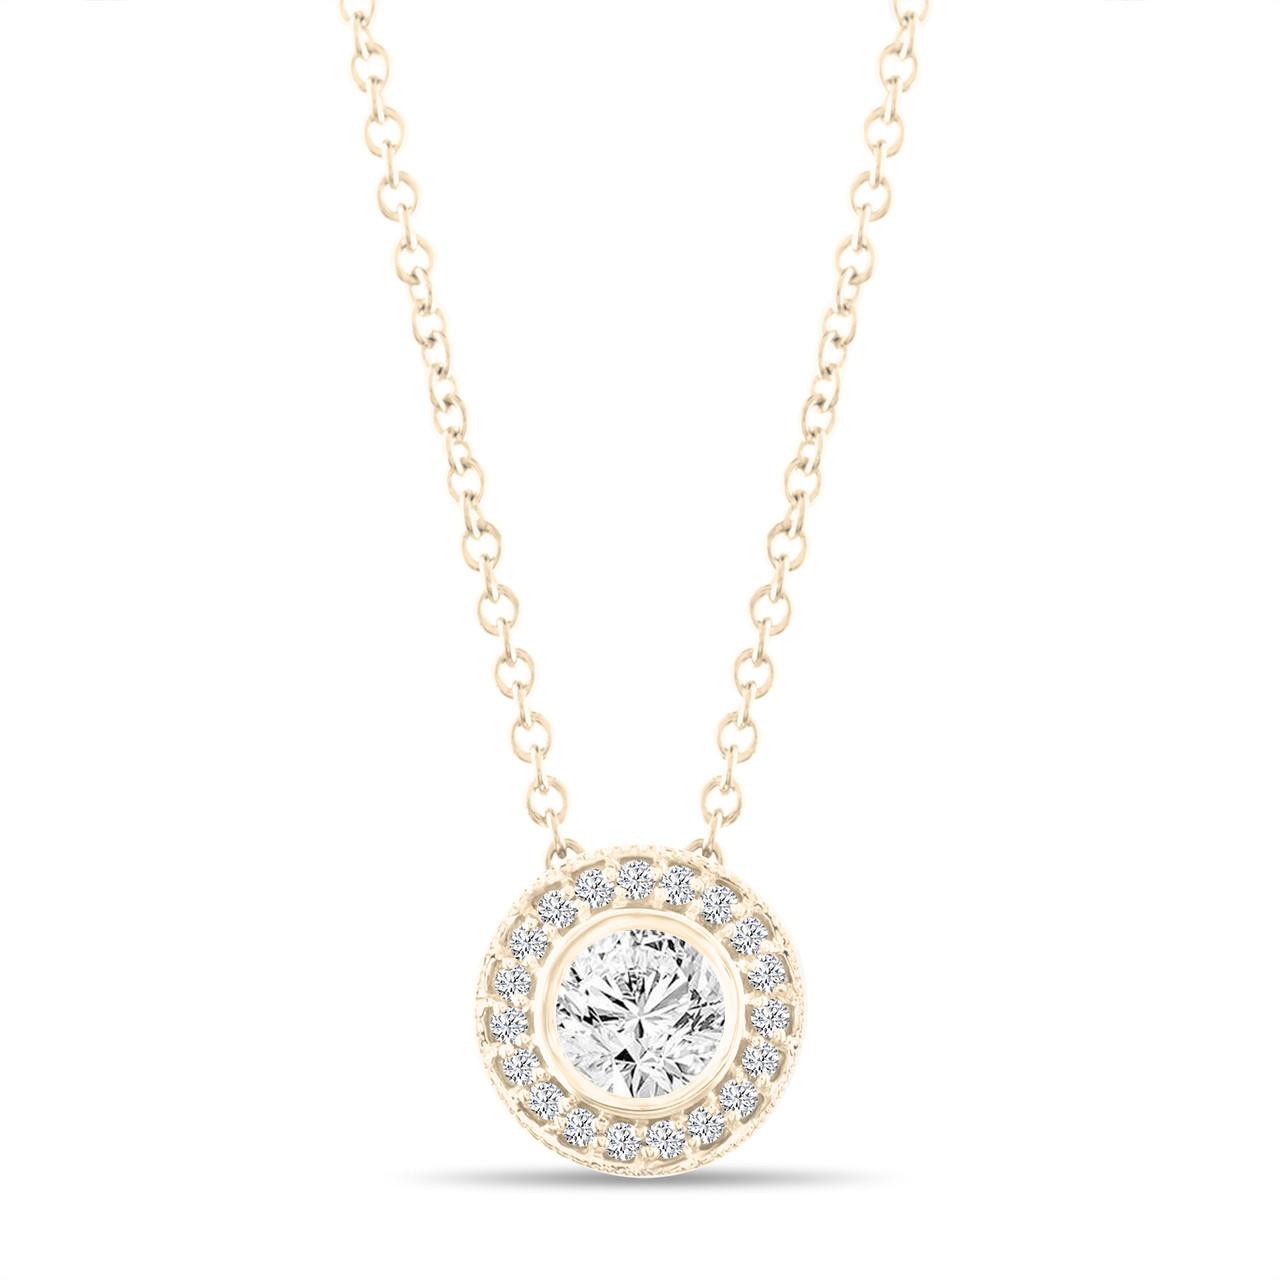 Micro pave diamond pendant necklace yellow gold pendant 042 carat micro pave diamond pendant necklace yellow gold pendant 042 carat bezel certified handmade aloadofball Images